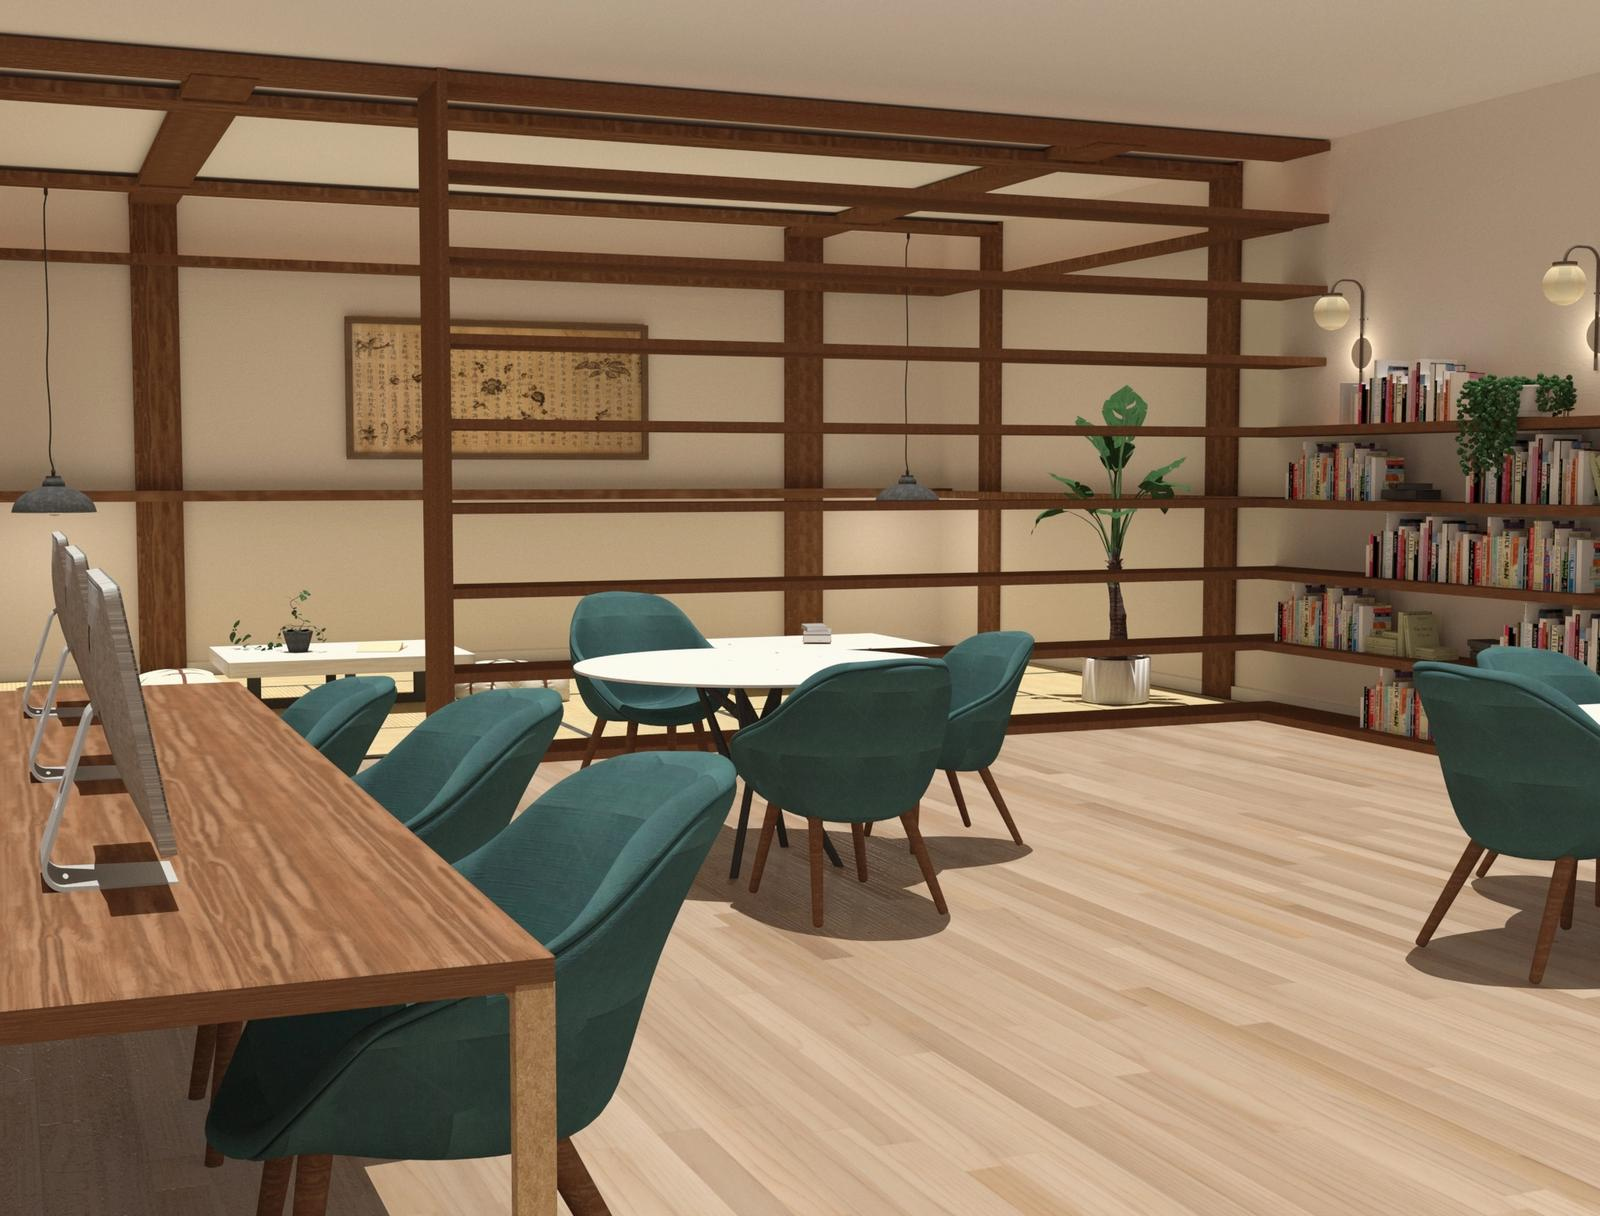 Interior Rendering 3